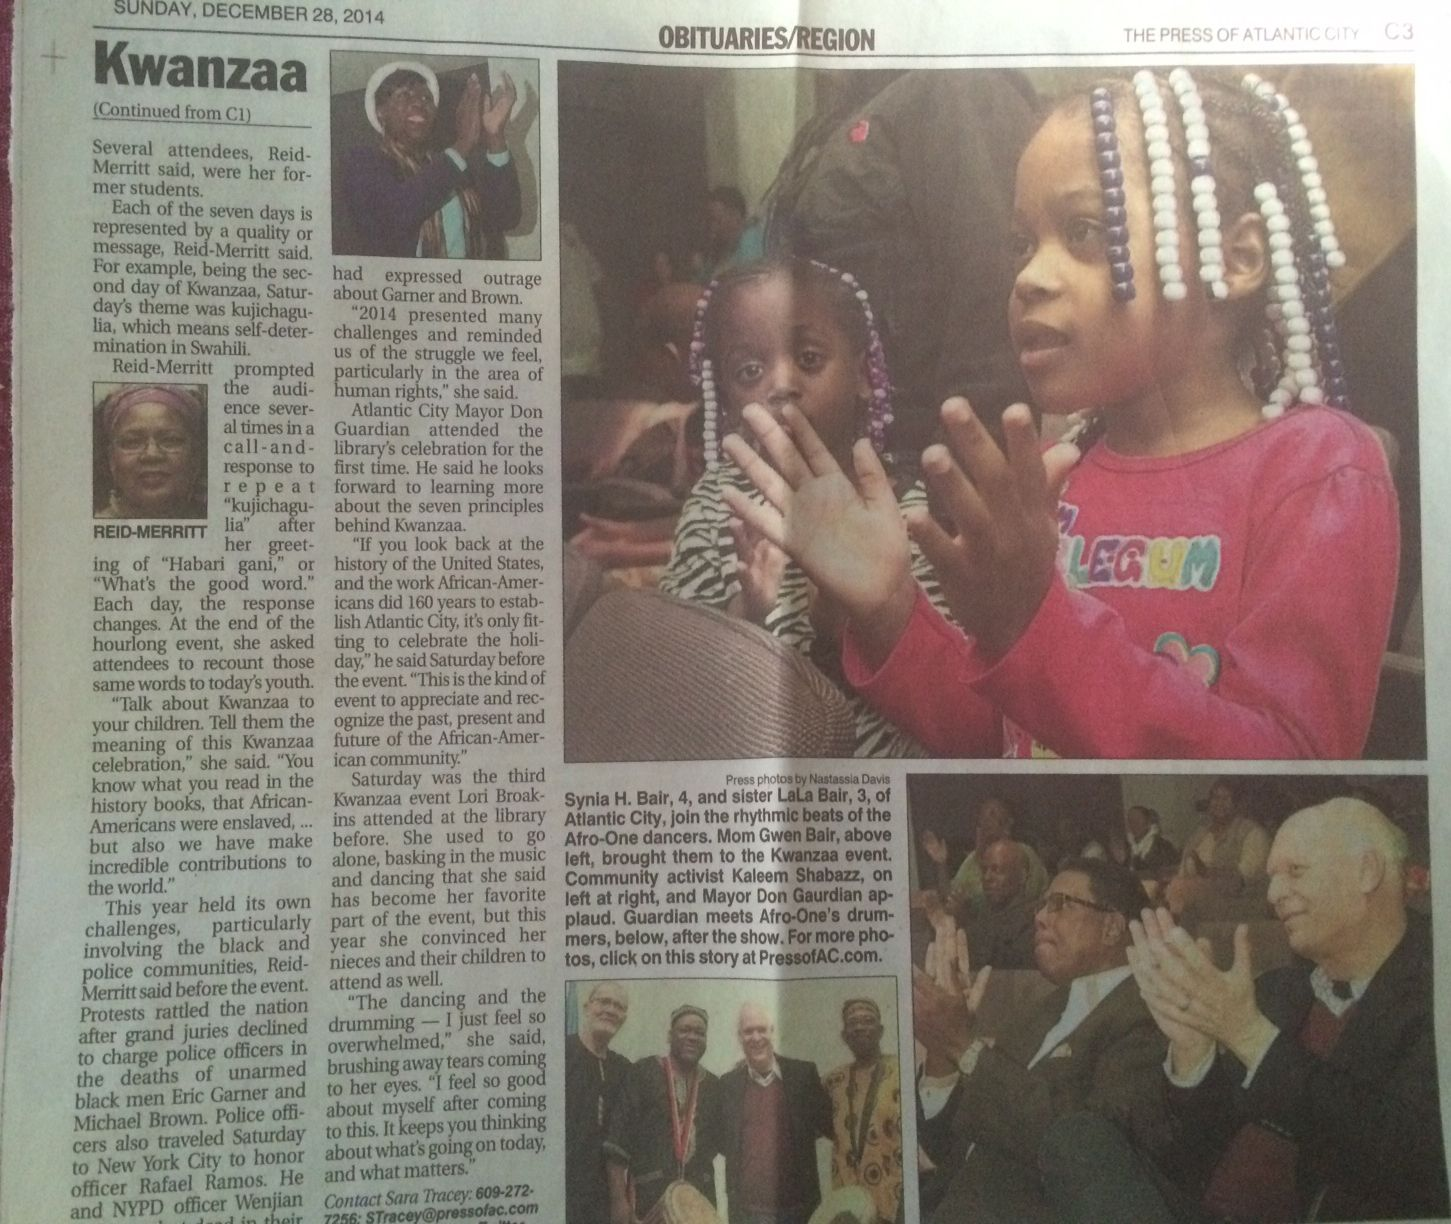 Press Of Atlantic City De 2014 Kwanzaa Celebration Atlantic City Kwanzaa Attendee